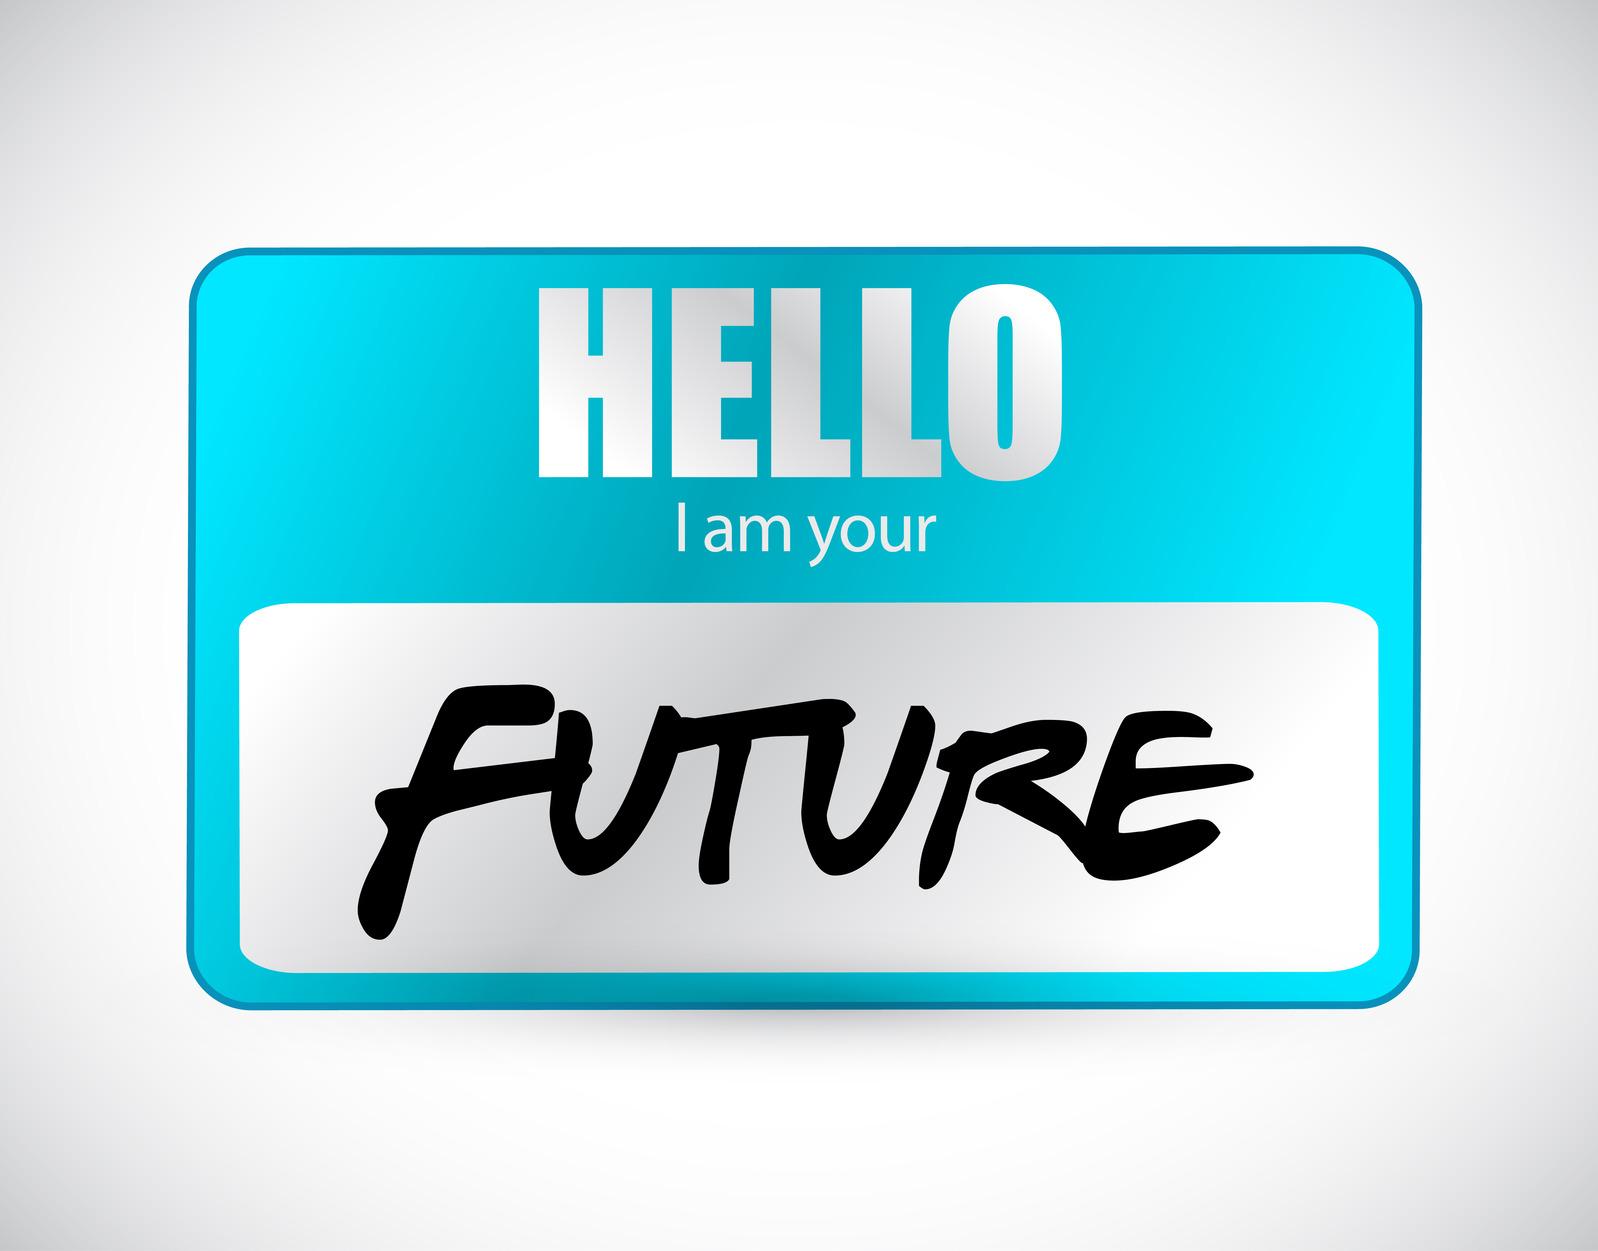 hello im your future name tag illustration design